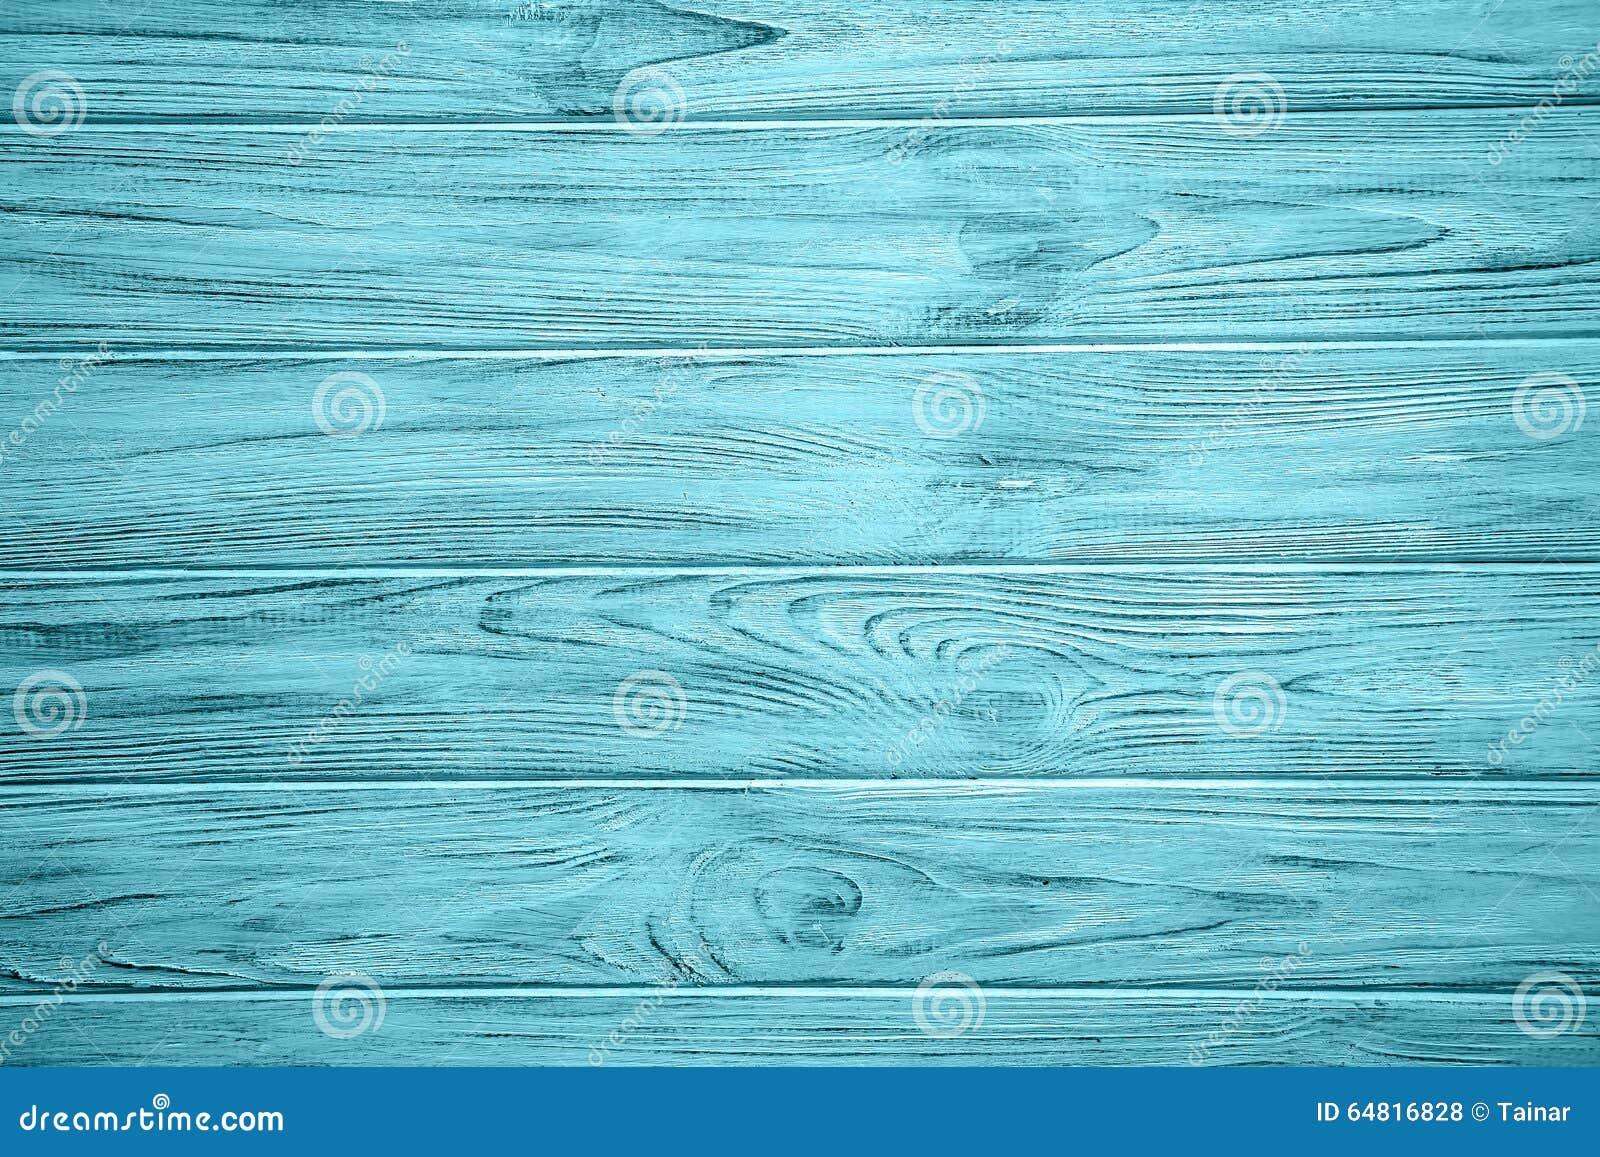 vintage blue wood background - photo #26